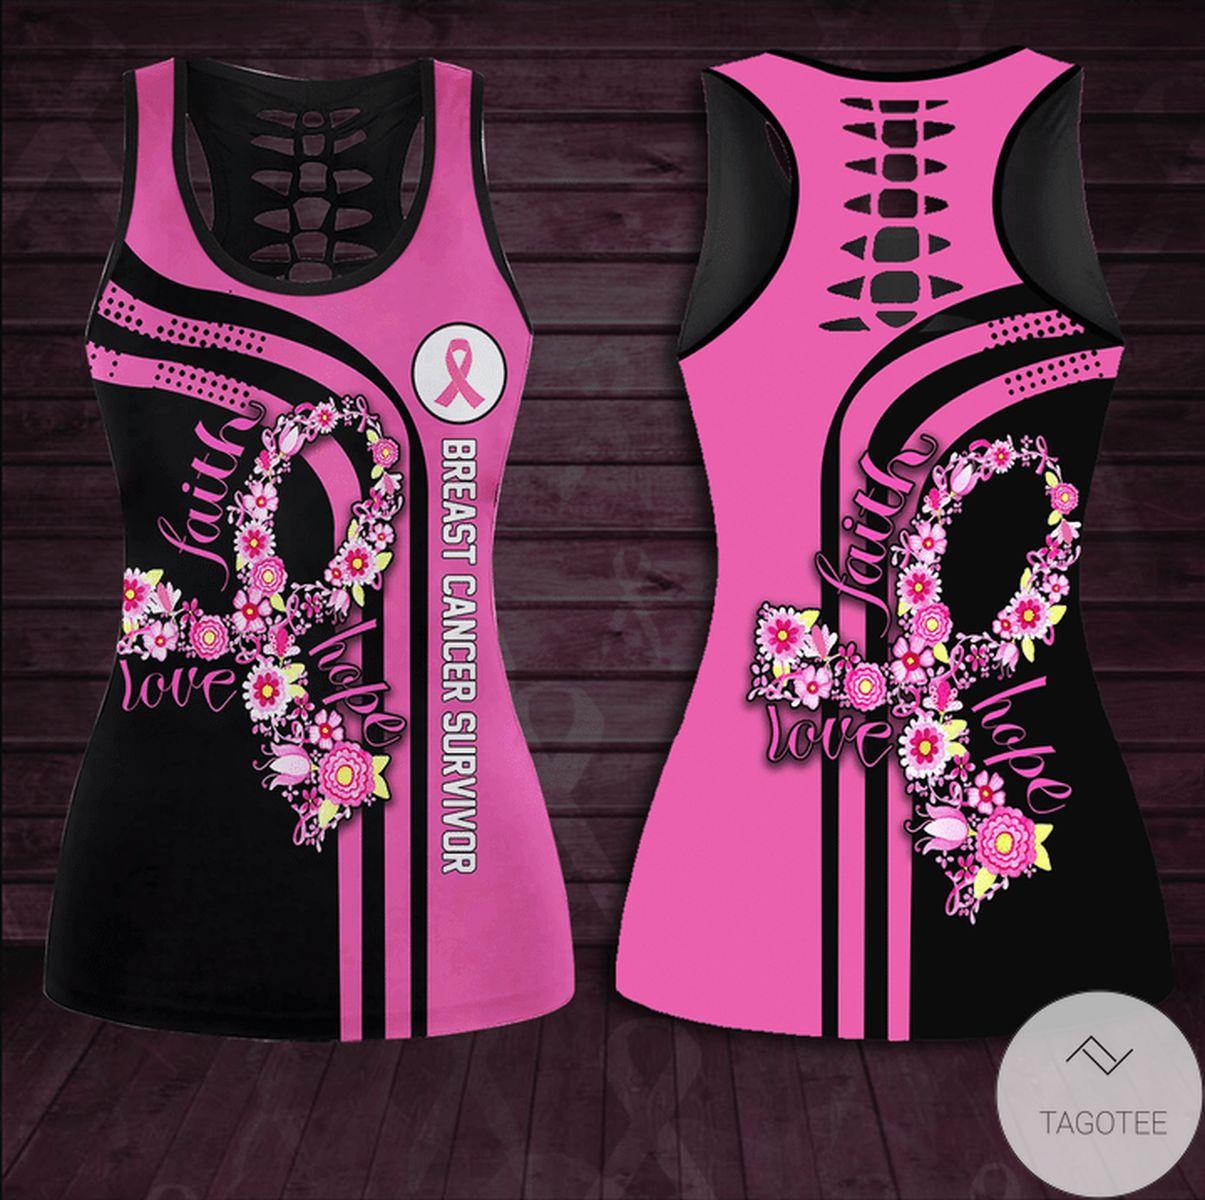 Amazon Breast Cancer Awareness Love - Faith - Hope Hollow Tank Top & Leggings Set